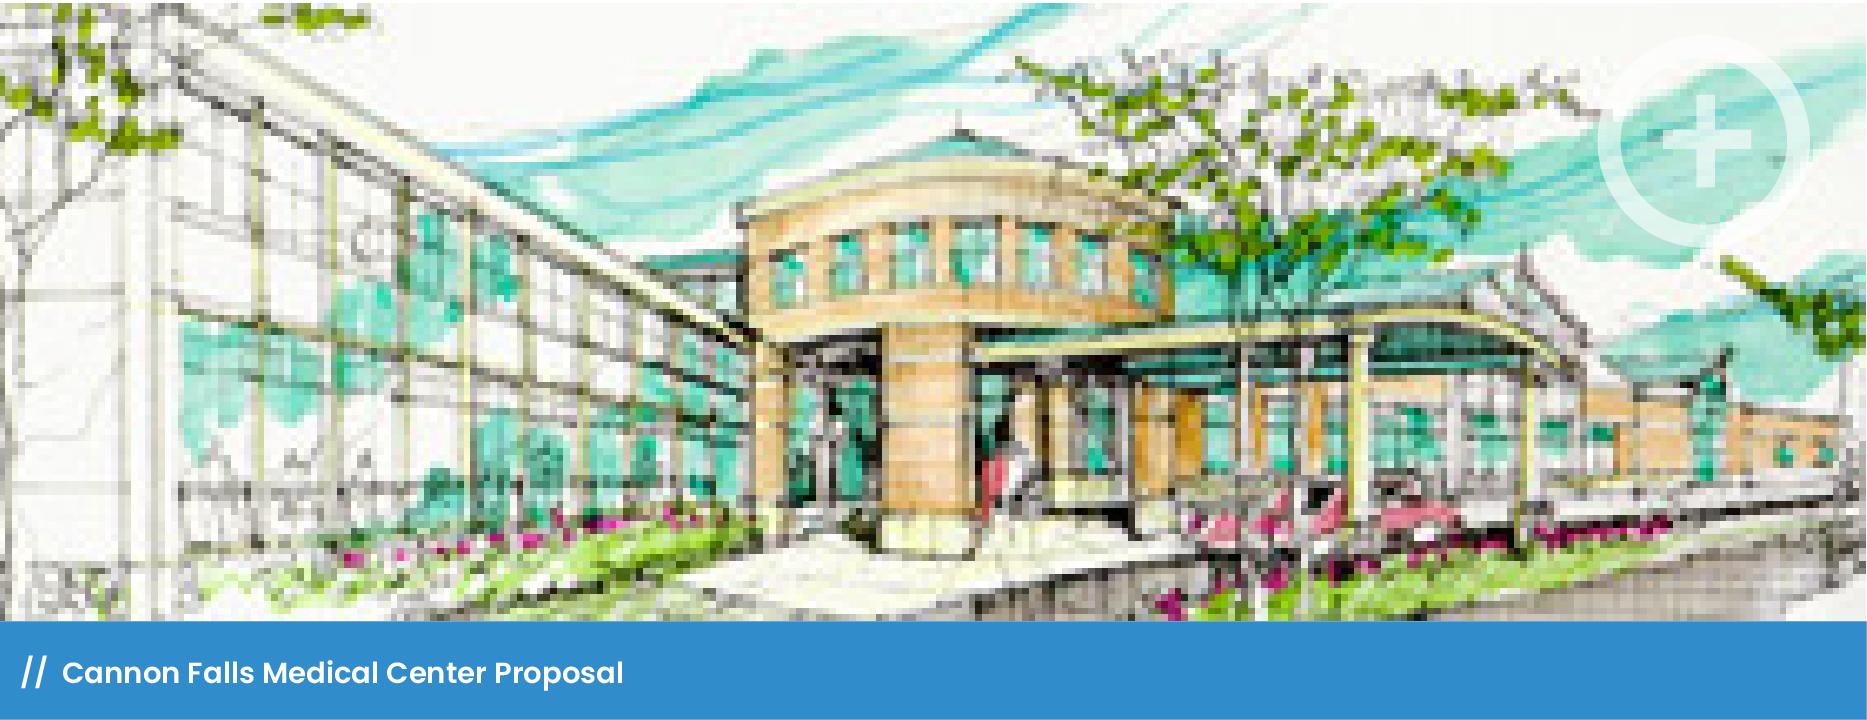 Yanik-Watermark_Cannon Falls Medical Center Proposal